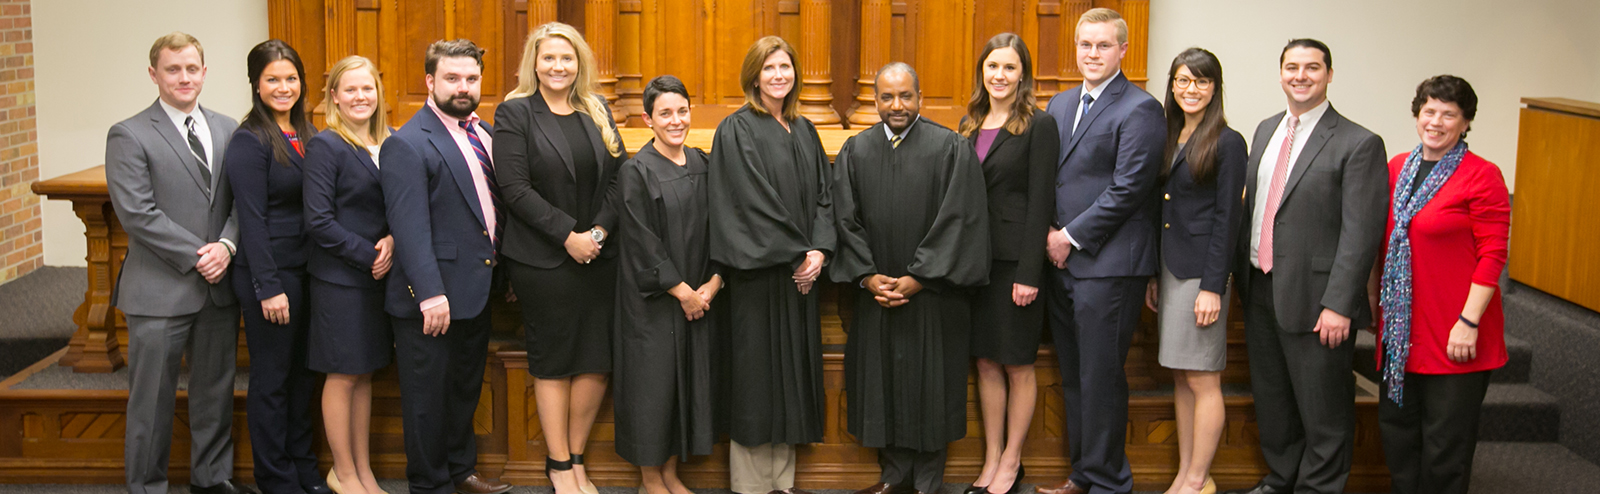 School of Law Students